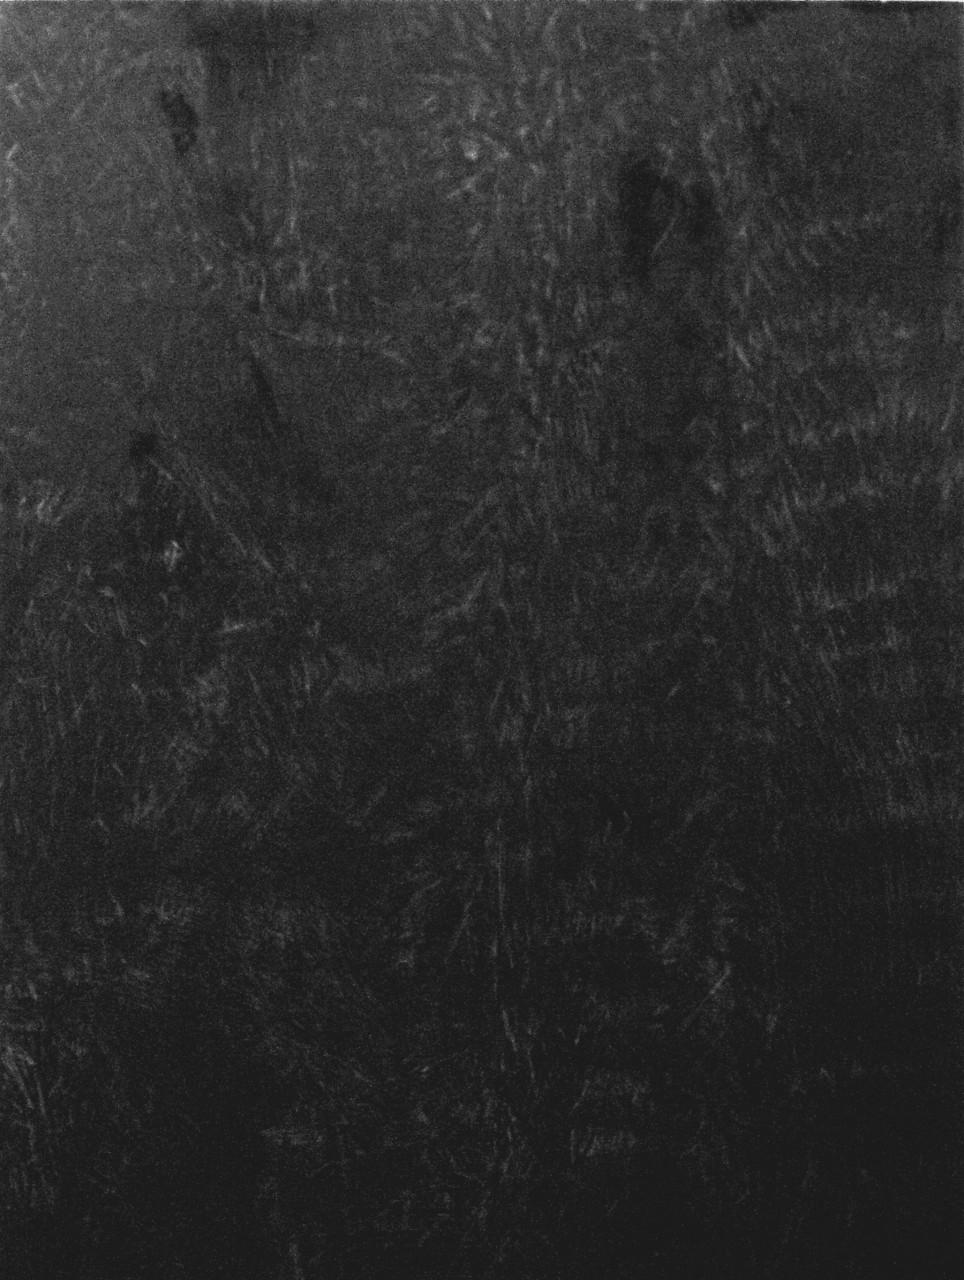 619, 2015 olio su tavola 89x67 cm